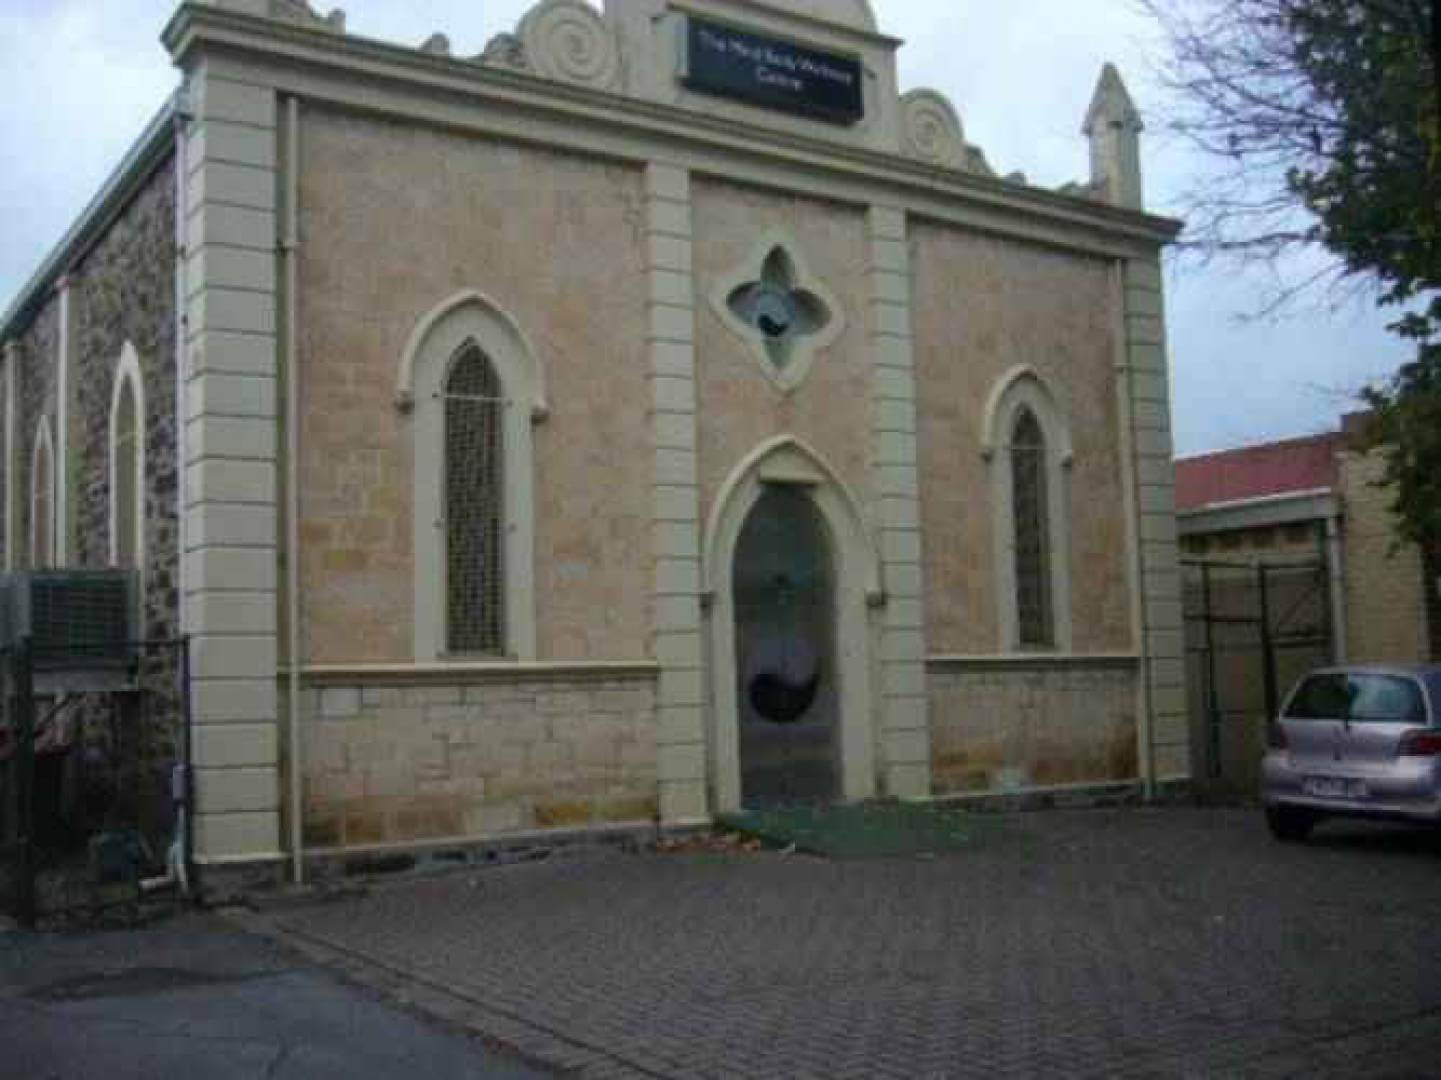 Norwood Methodist Church - Former